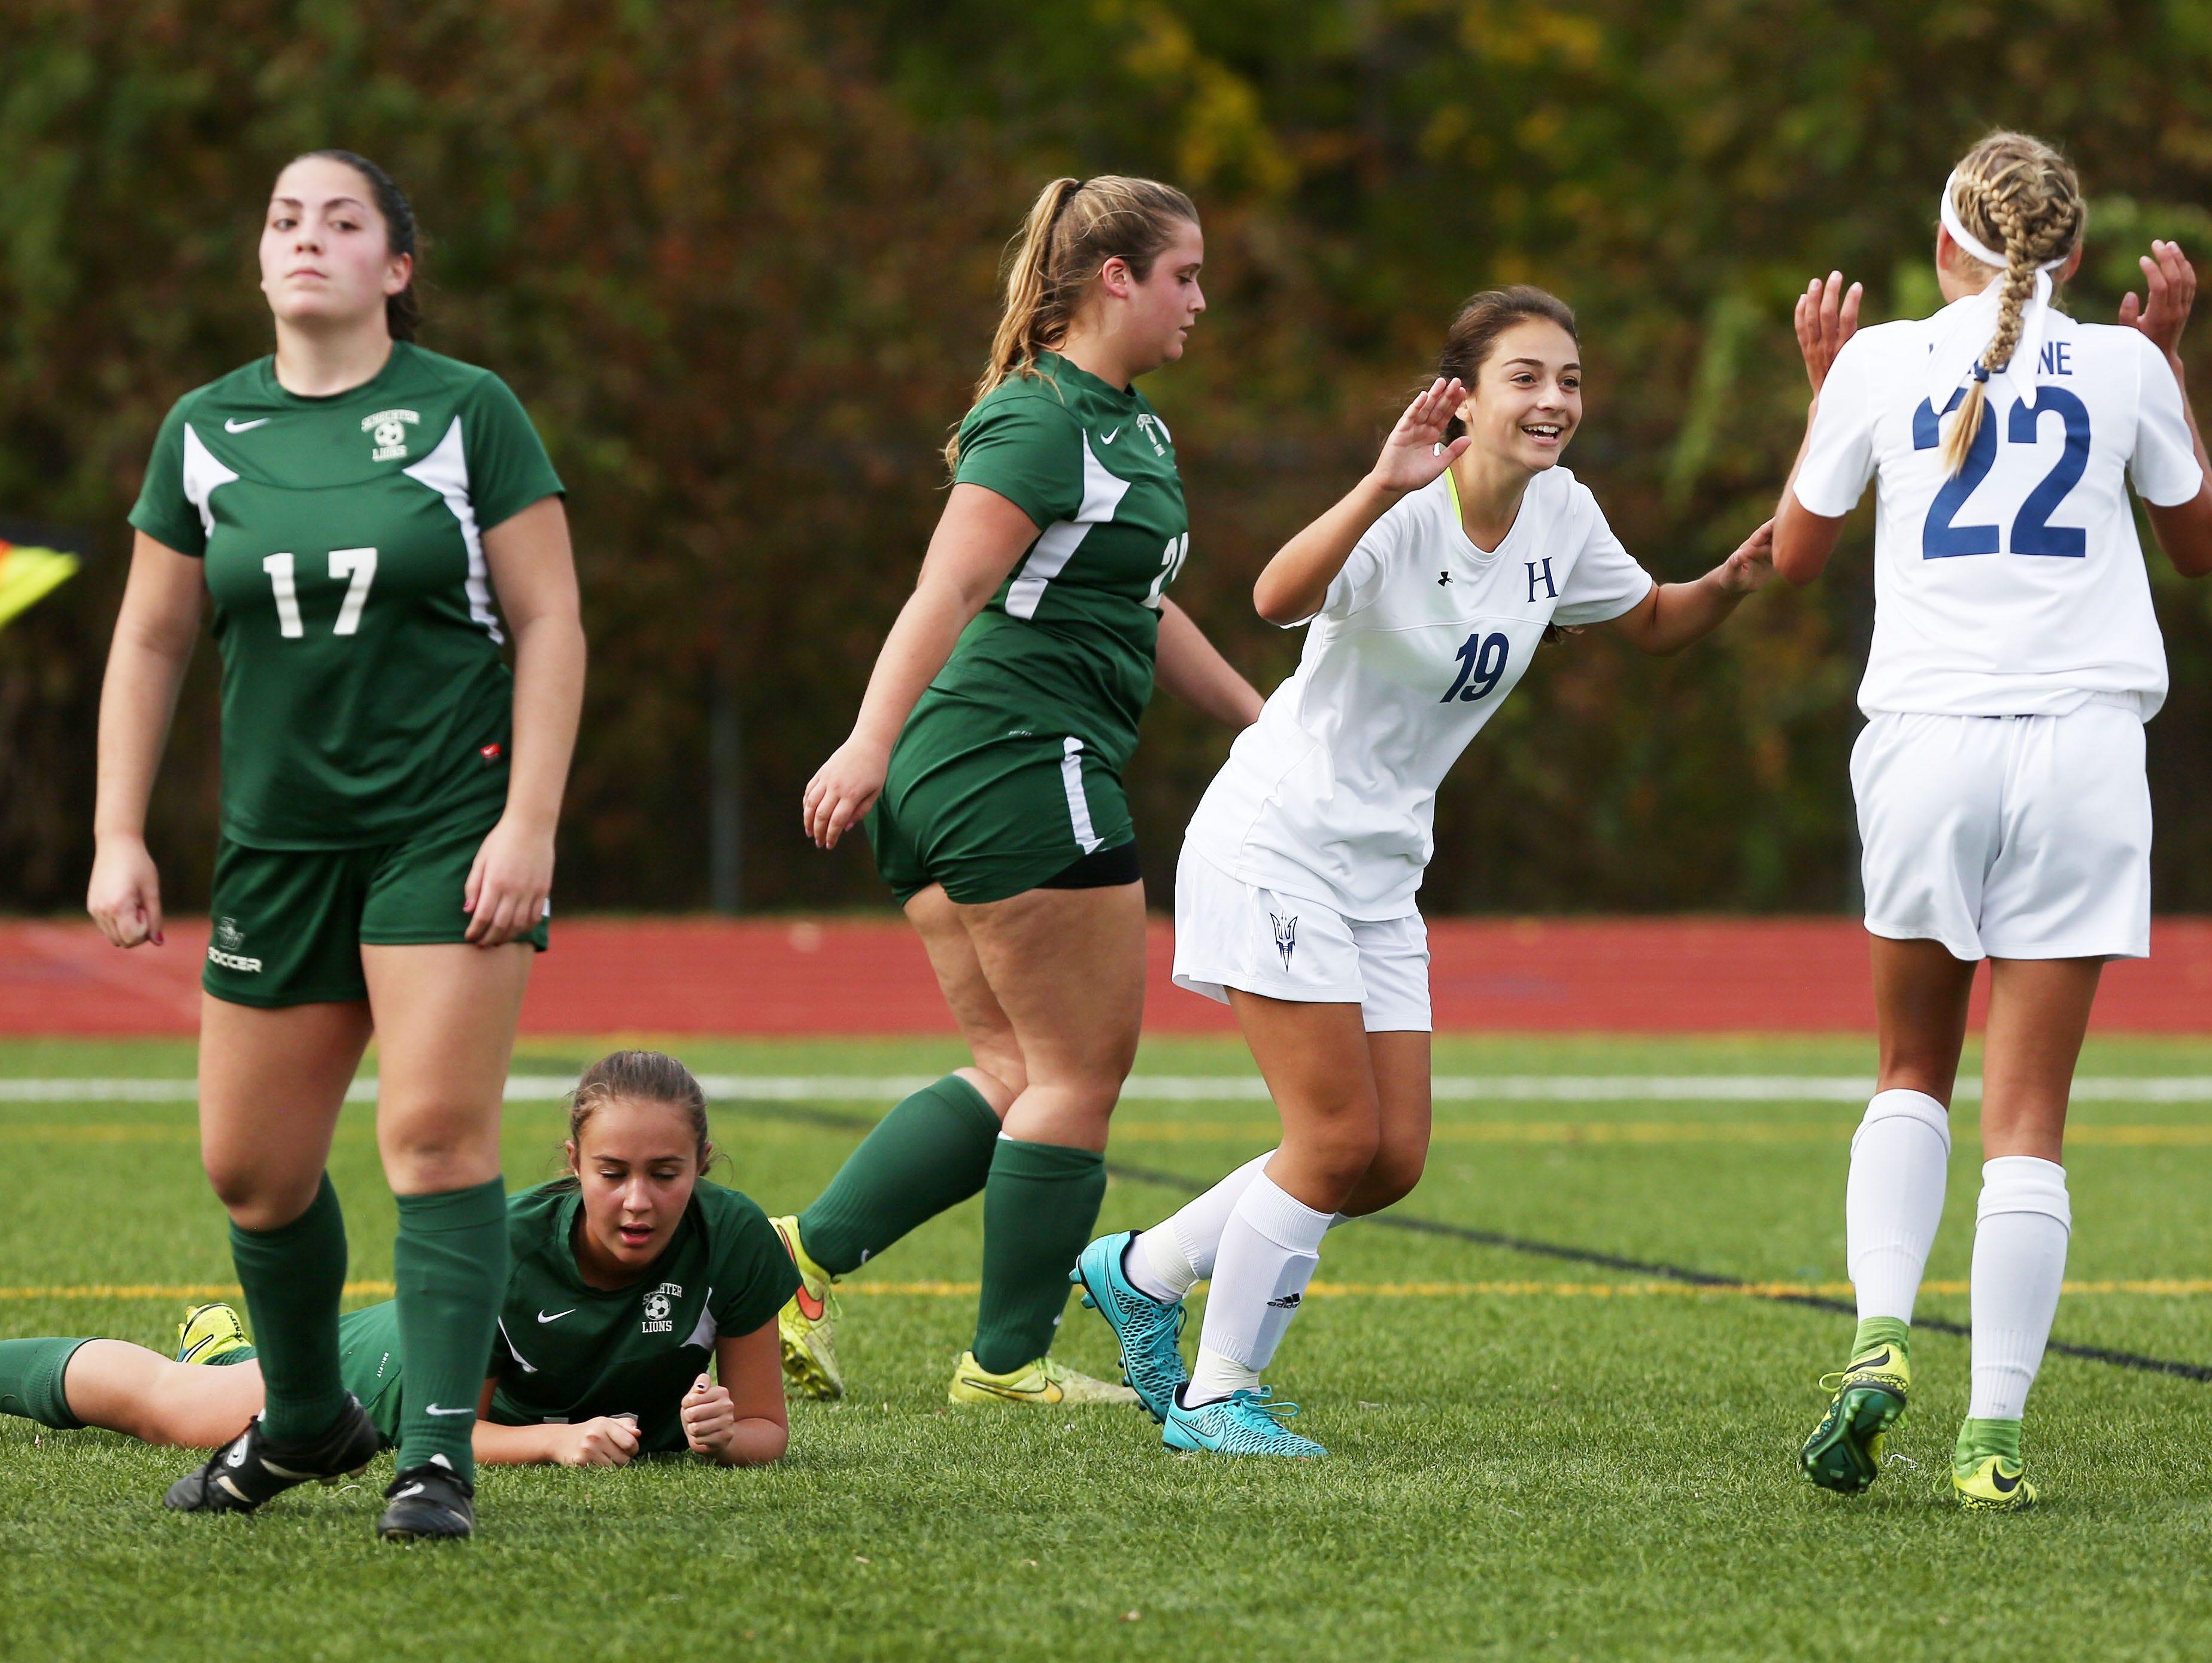 Haldane's Robin Ben-Adi (19) celebrates her second half goal with teammates against Schechter in the girls soccer Section 1 Class C championship game at Yorktown High School Oct. 30, 2016. Haldane won the game 3-0.